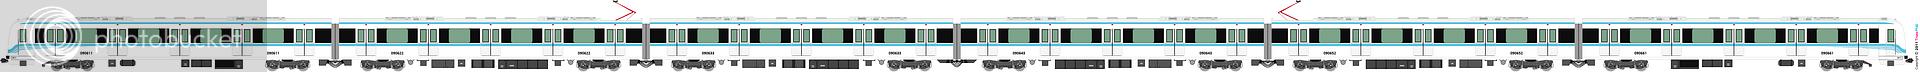 Train 2276